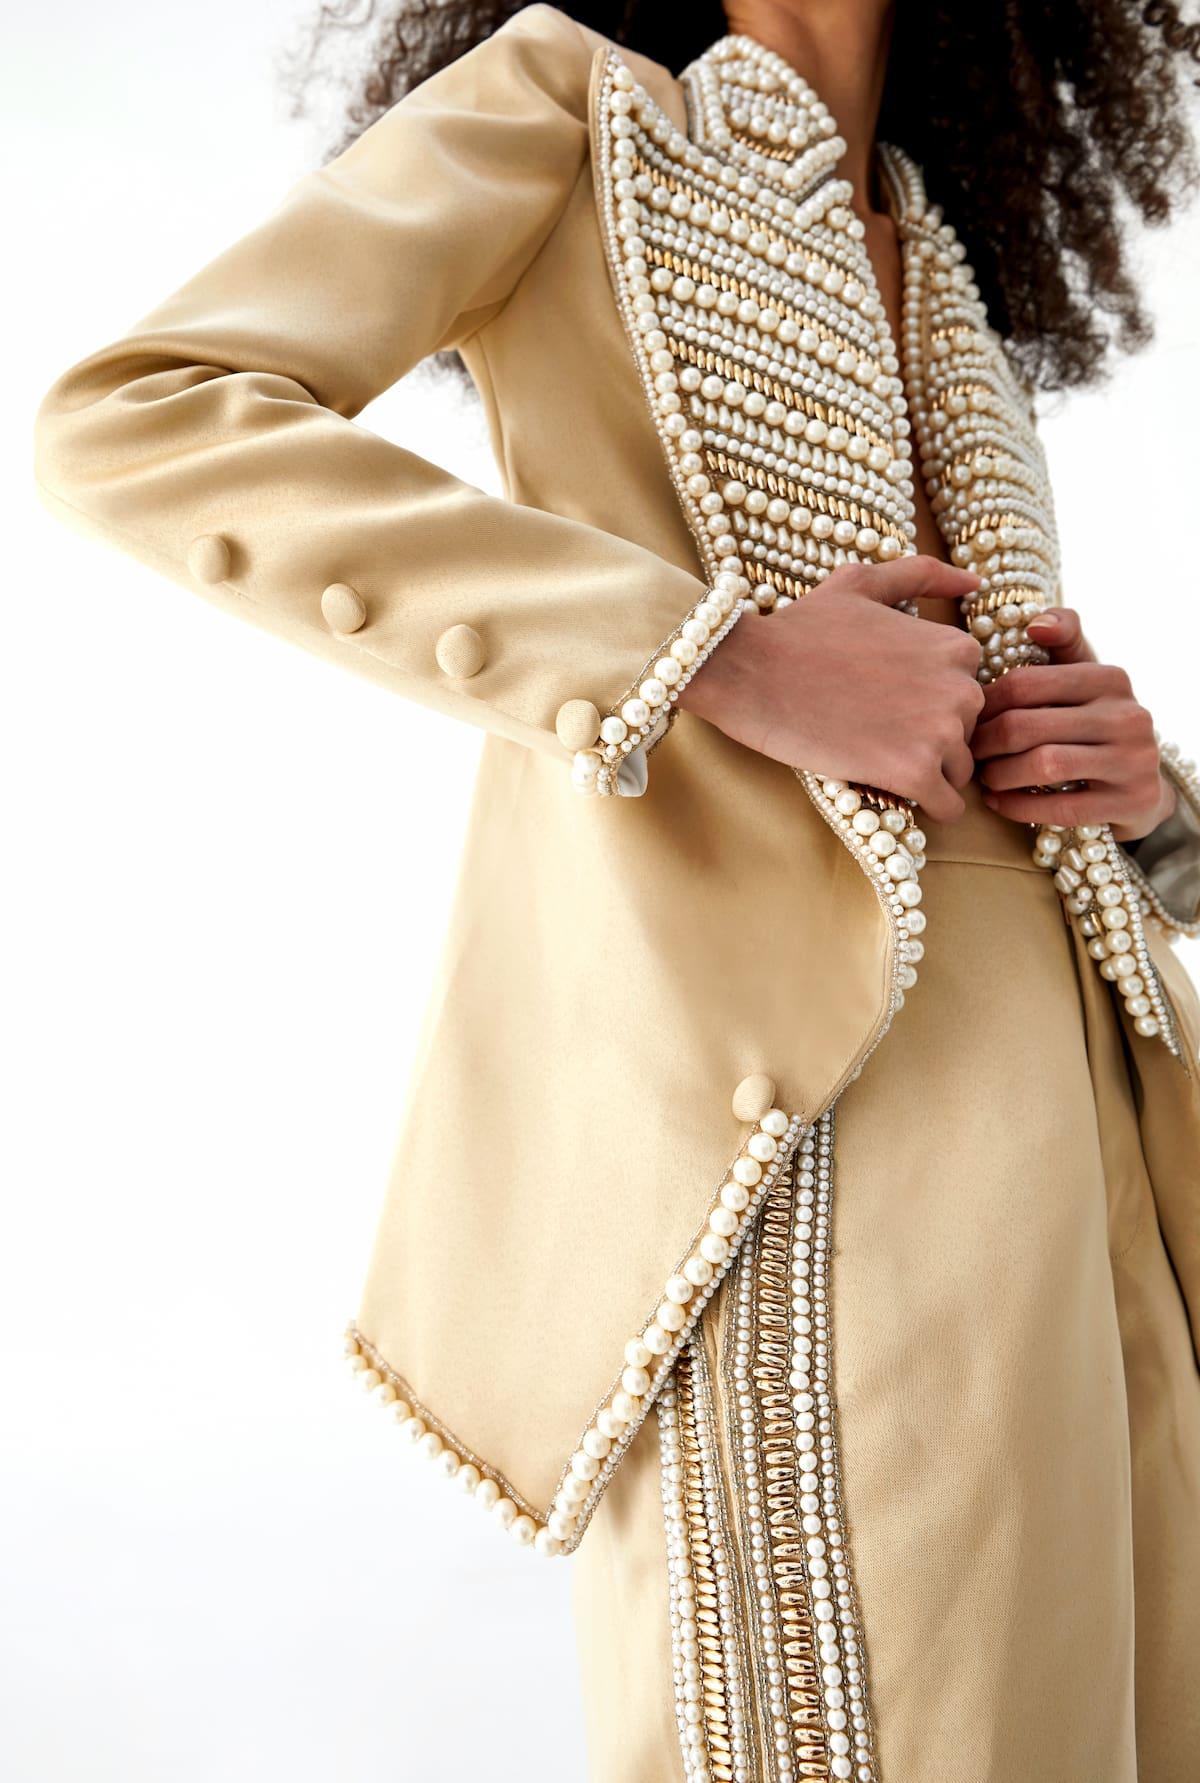 View 2 of model wearing Kismah Blazer in sand gold.